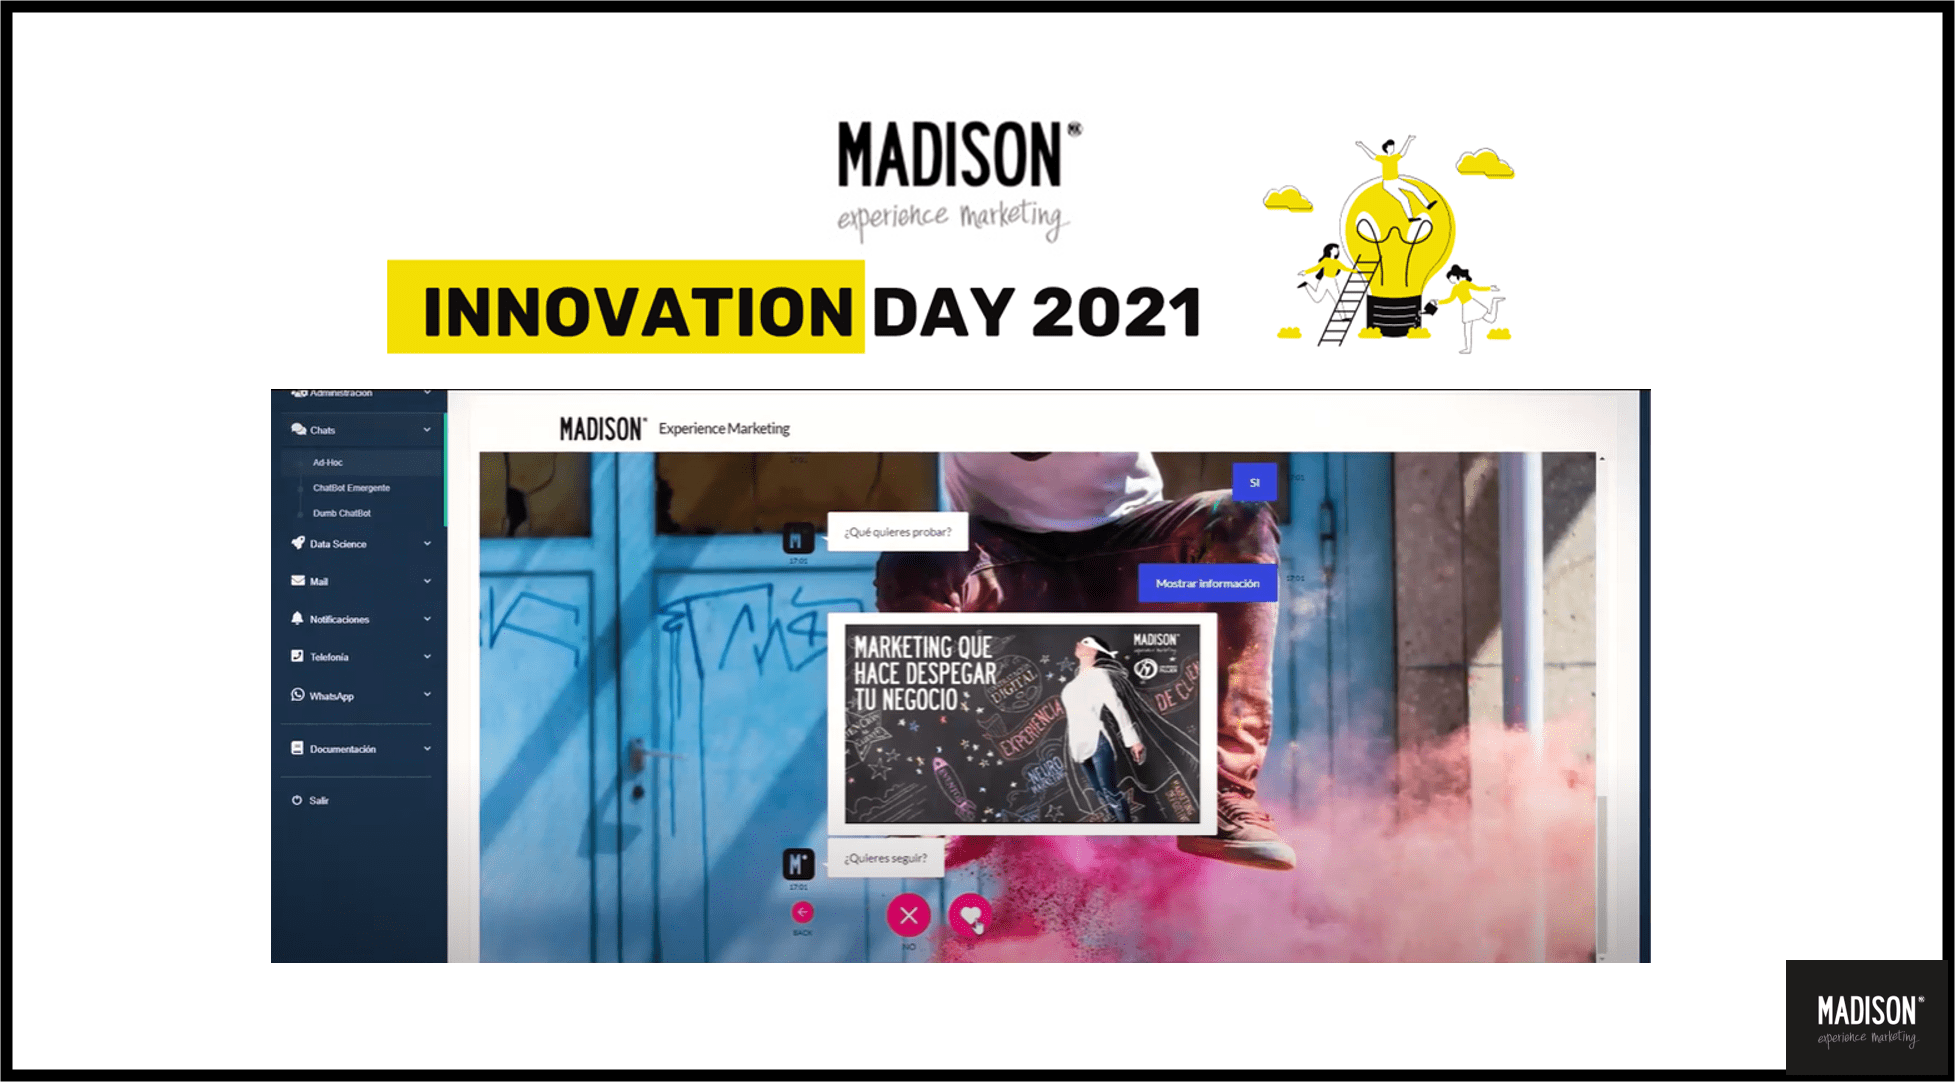 Innovation Day 2021